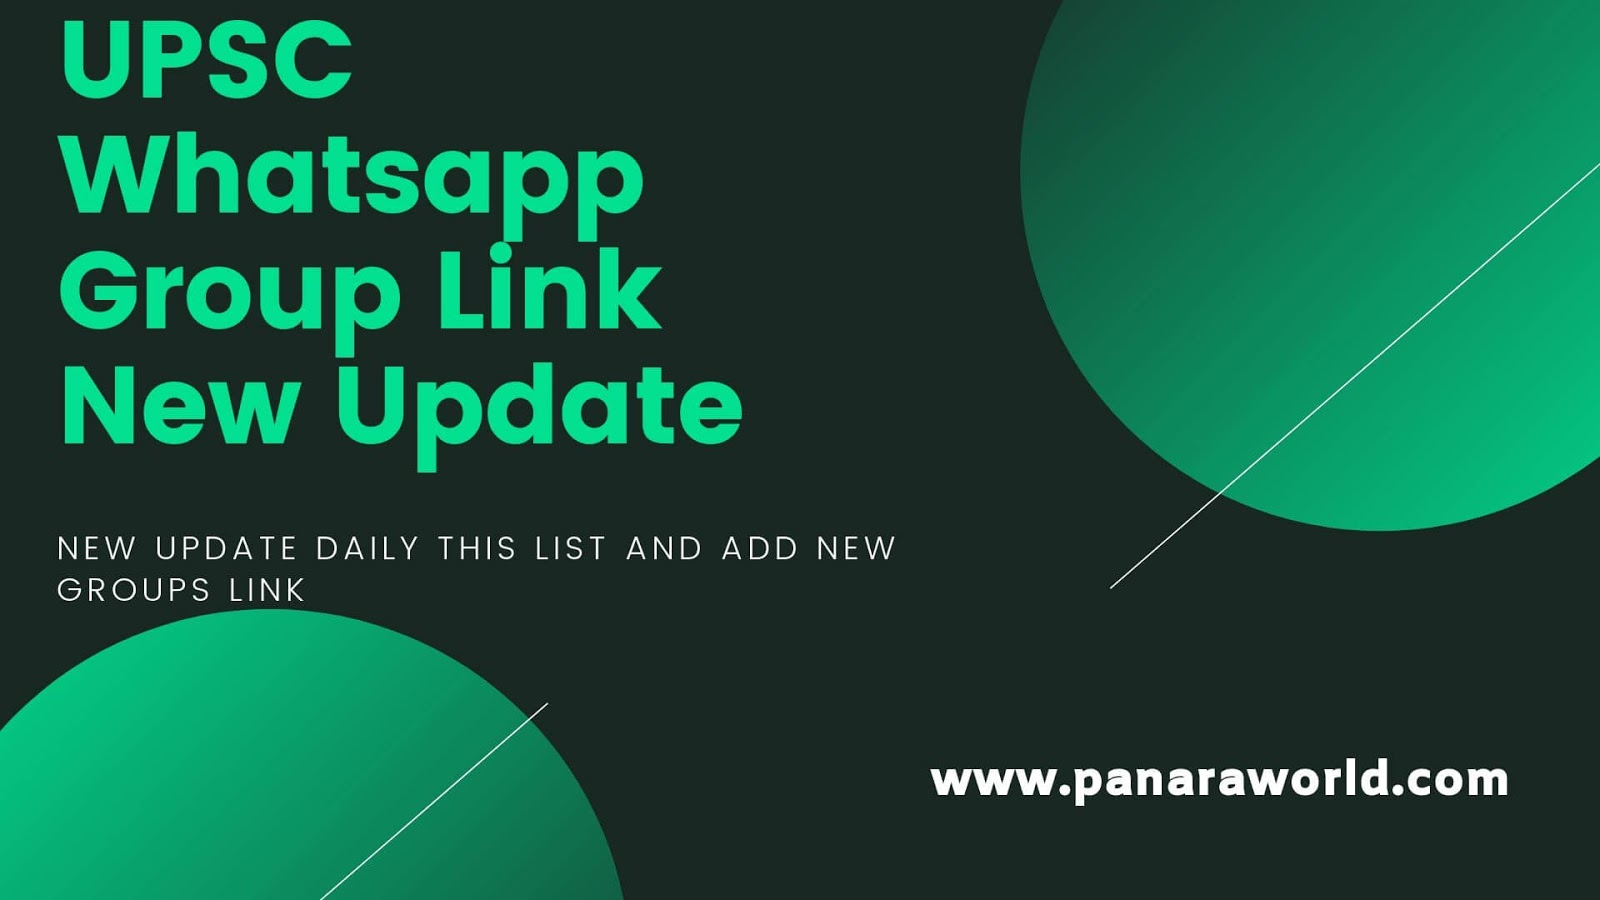 UPSC Whatsapp Group Link 2019 Today Update - Panaraworld - Indian